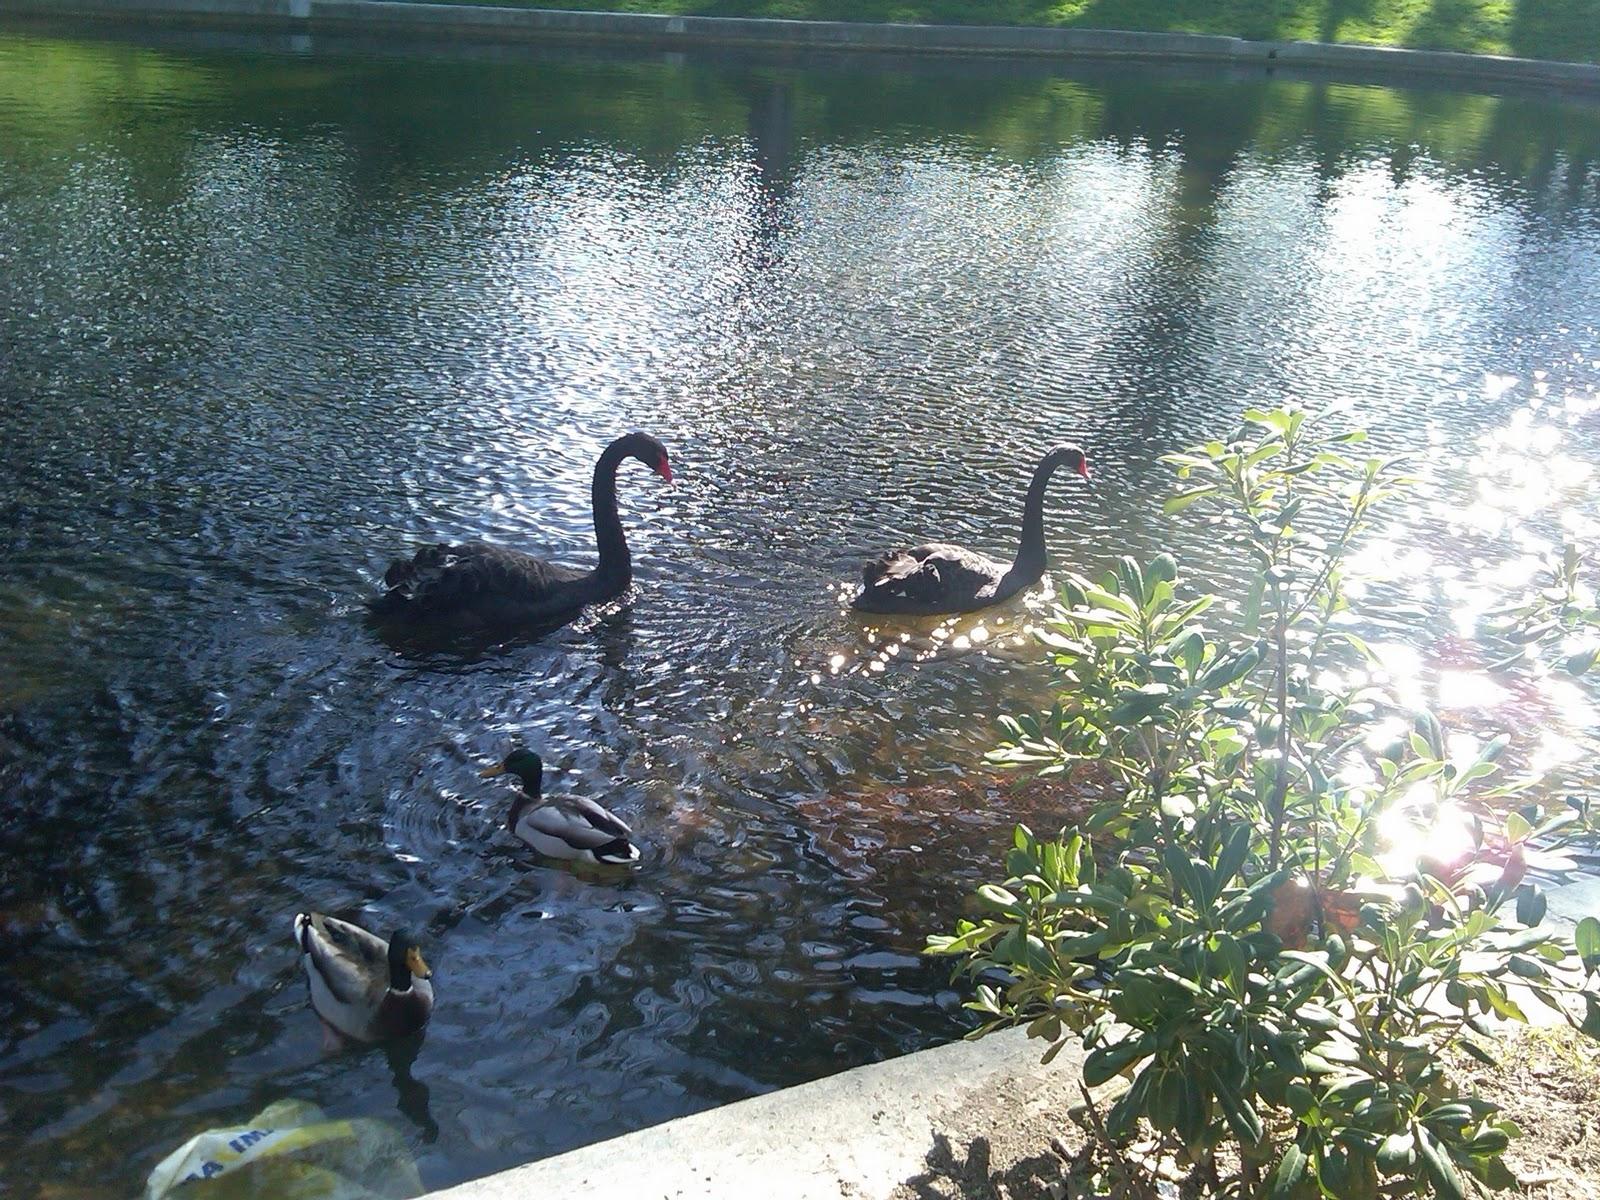 Black swan movie schedule toledo oh